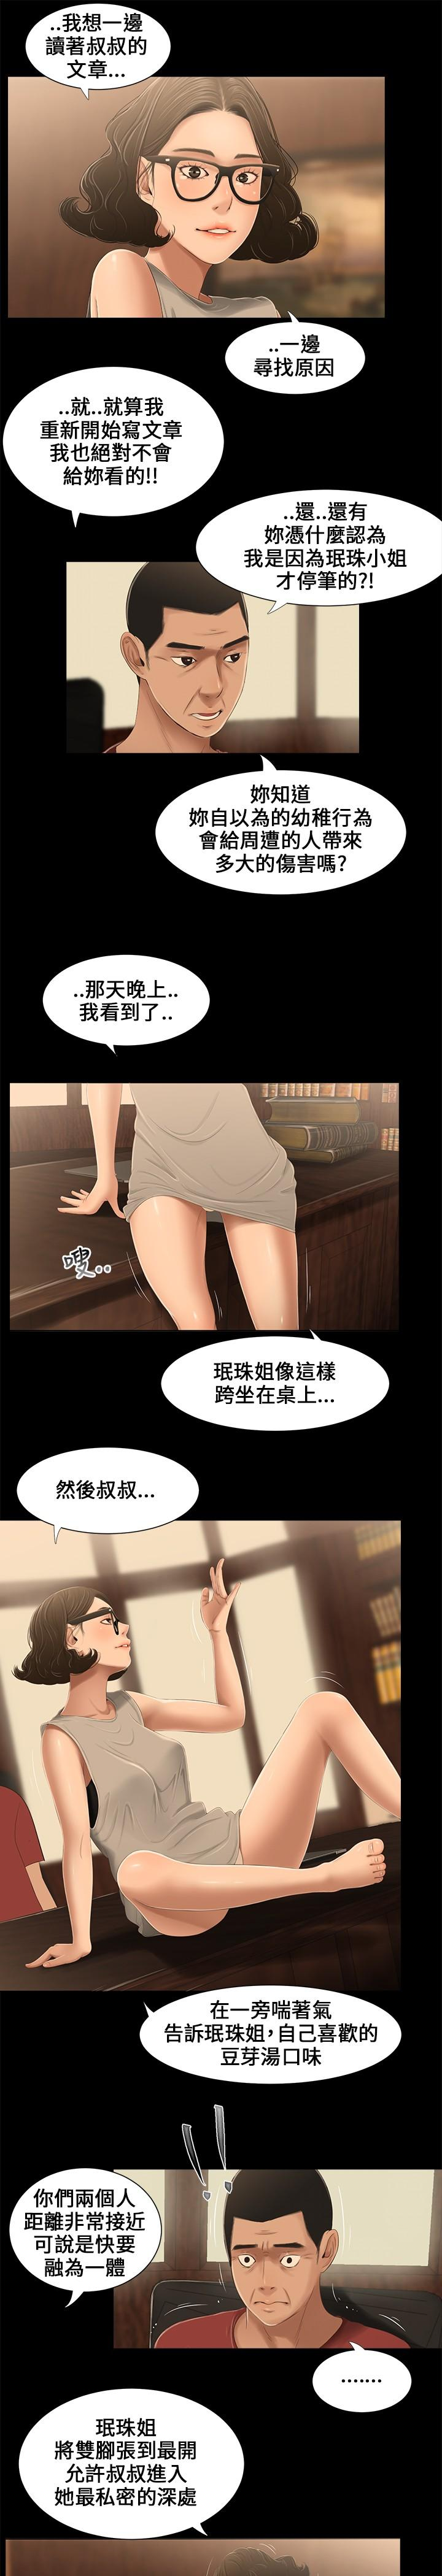 Three sisters 三姐妹Ch.13~19 (Chinese)中文 10